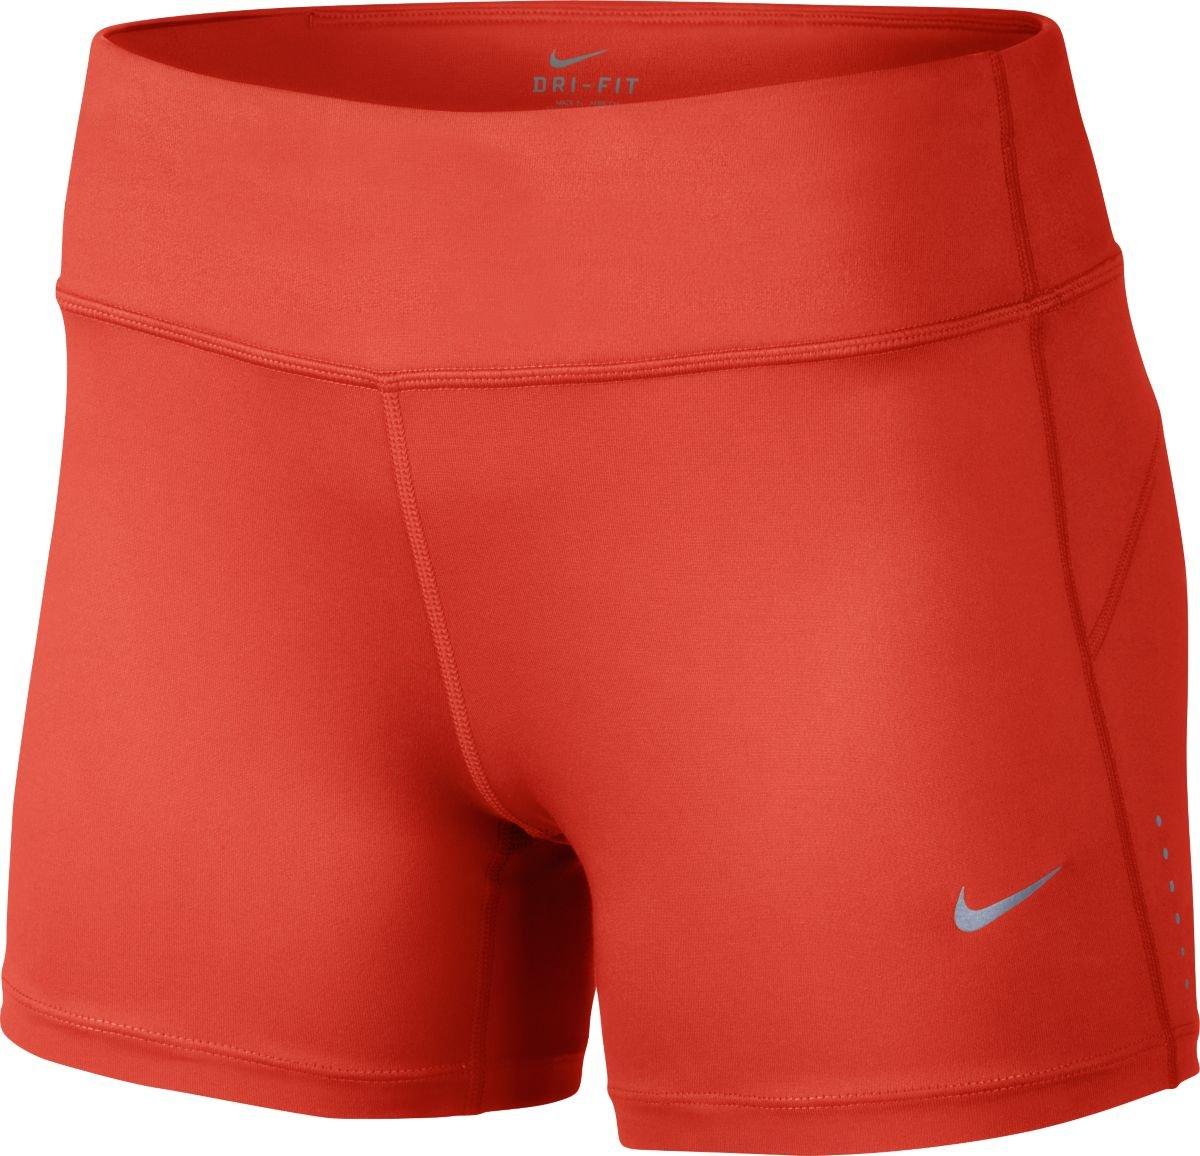 "Šortky Nike 2.5"" EPIC RUN BOY SHORT"